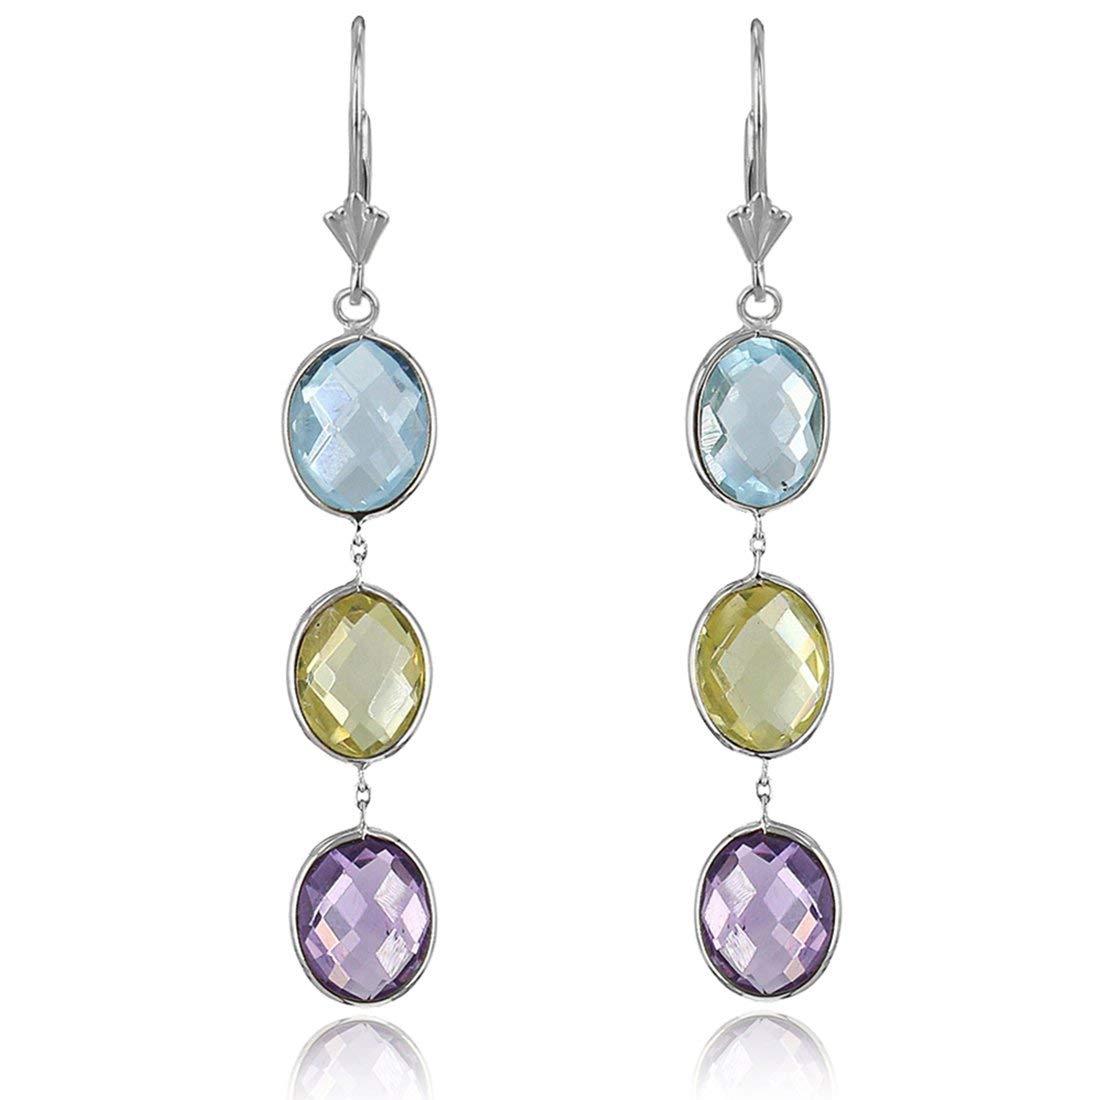 14k White Gold Gemstone Earrings with Oval Amethyst, Blue Topaz And Lemon Quartz Stations